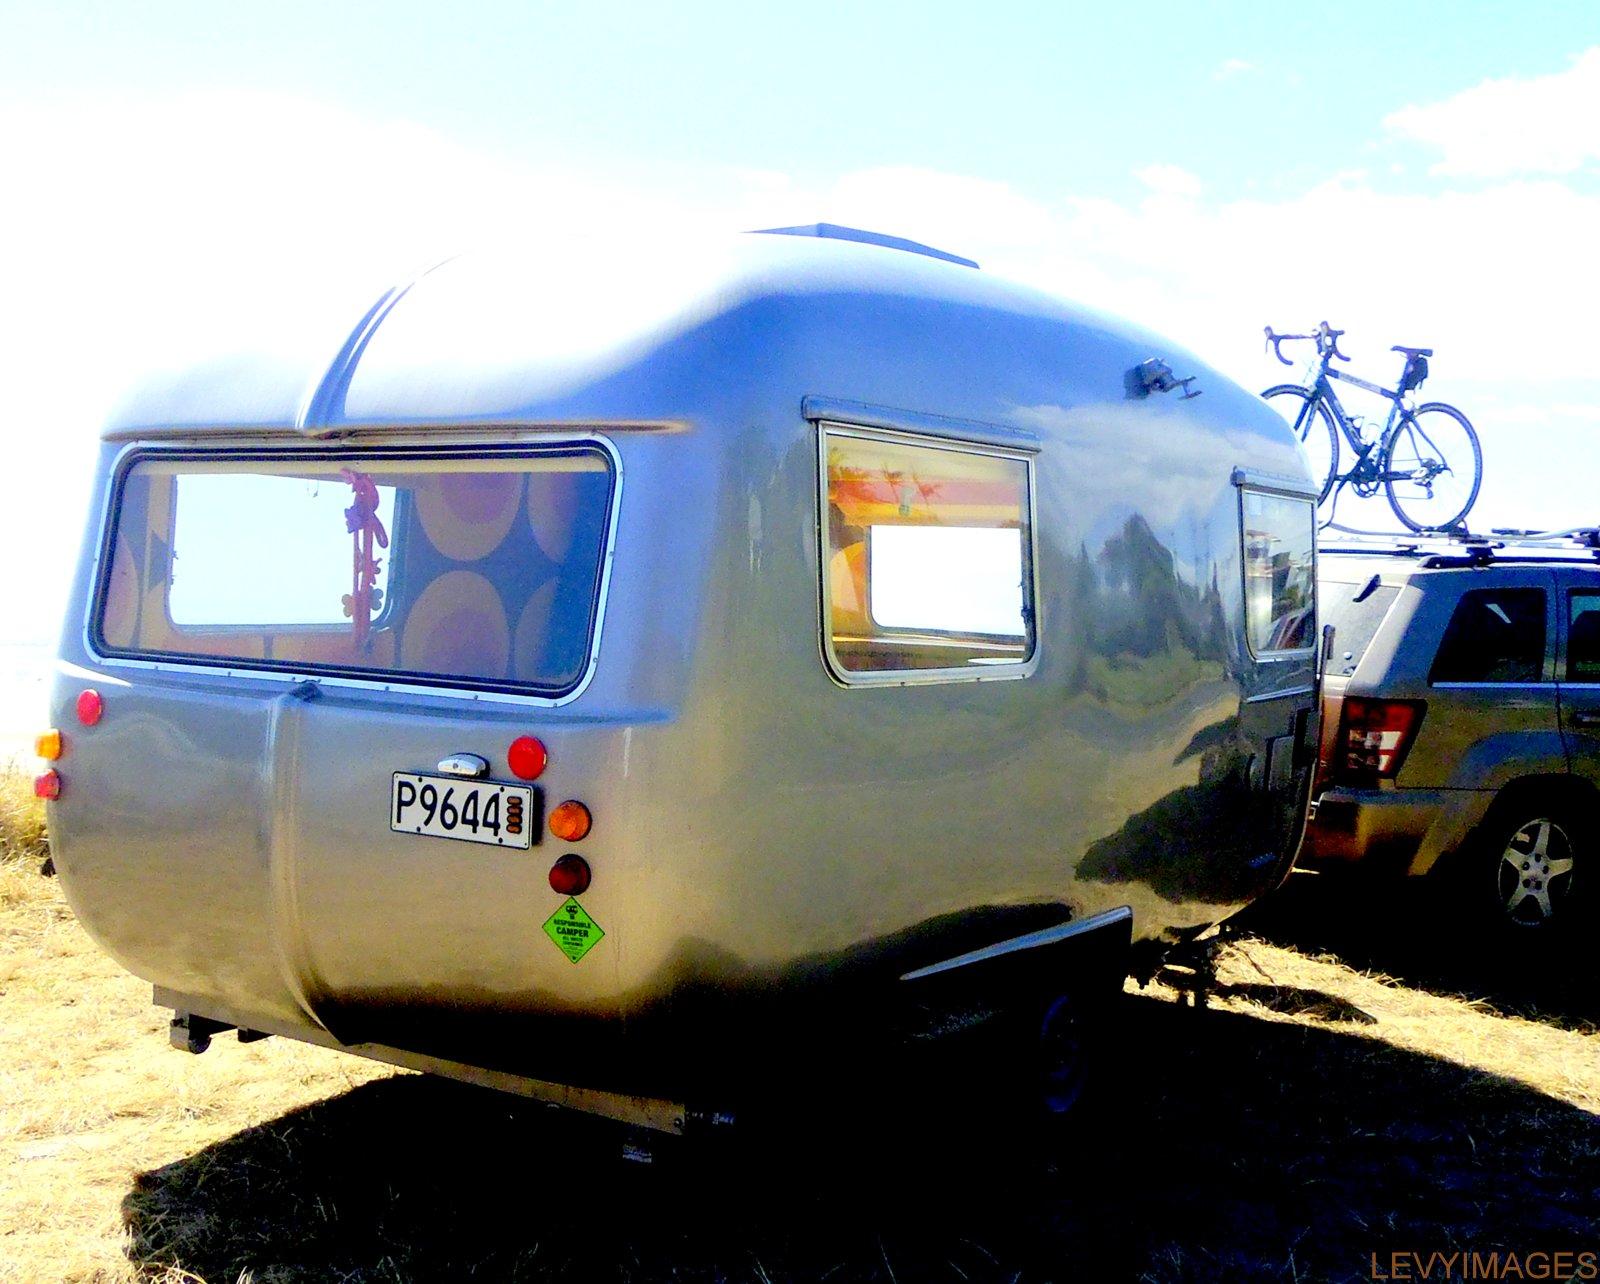 http://1.bp.blogspot.com/-G1TfSYMmQr0/UT0OoAbNkwI/AAAAAAAANXw/Jalr5bzPzrE/s1600/bubbles-retro-artdeco-vintage-fibreglass-1972-oxford-concord-new-zealand-caravan-hil-mario-stapper-life-enjoyers-wanaka-freedom-camping-the-flying-tortoise-006.jpg